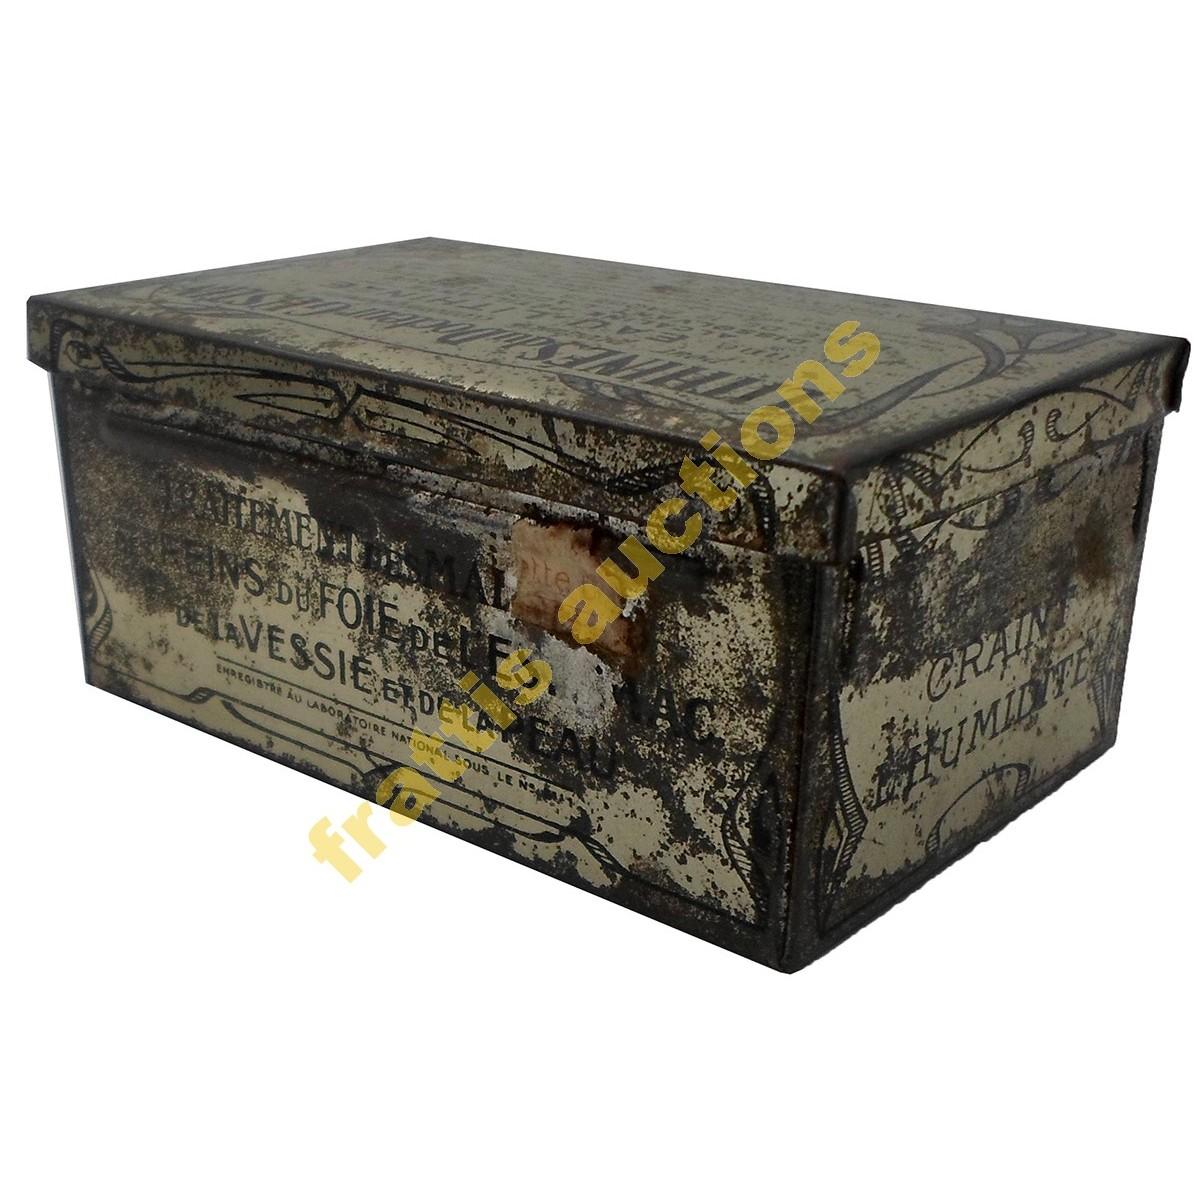 Lithines du Docteur Gustin, μεταλλικό κουτί.